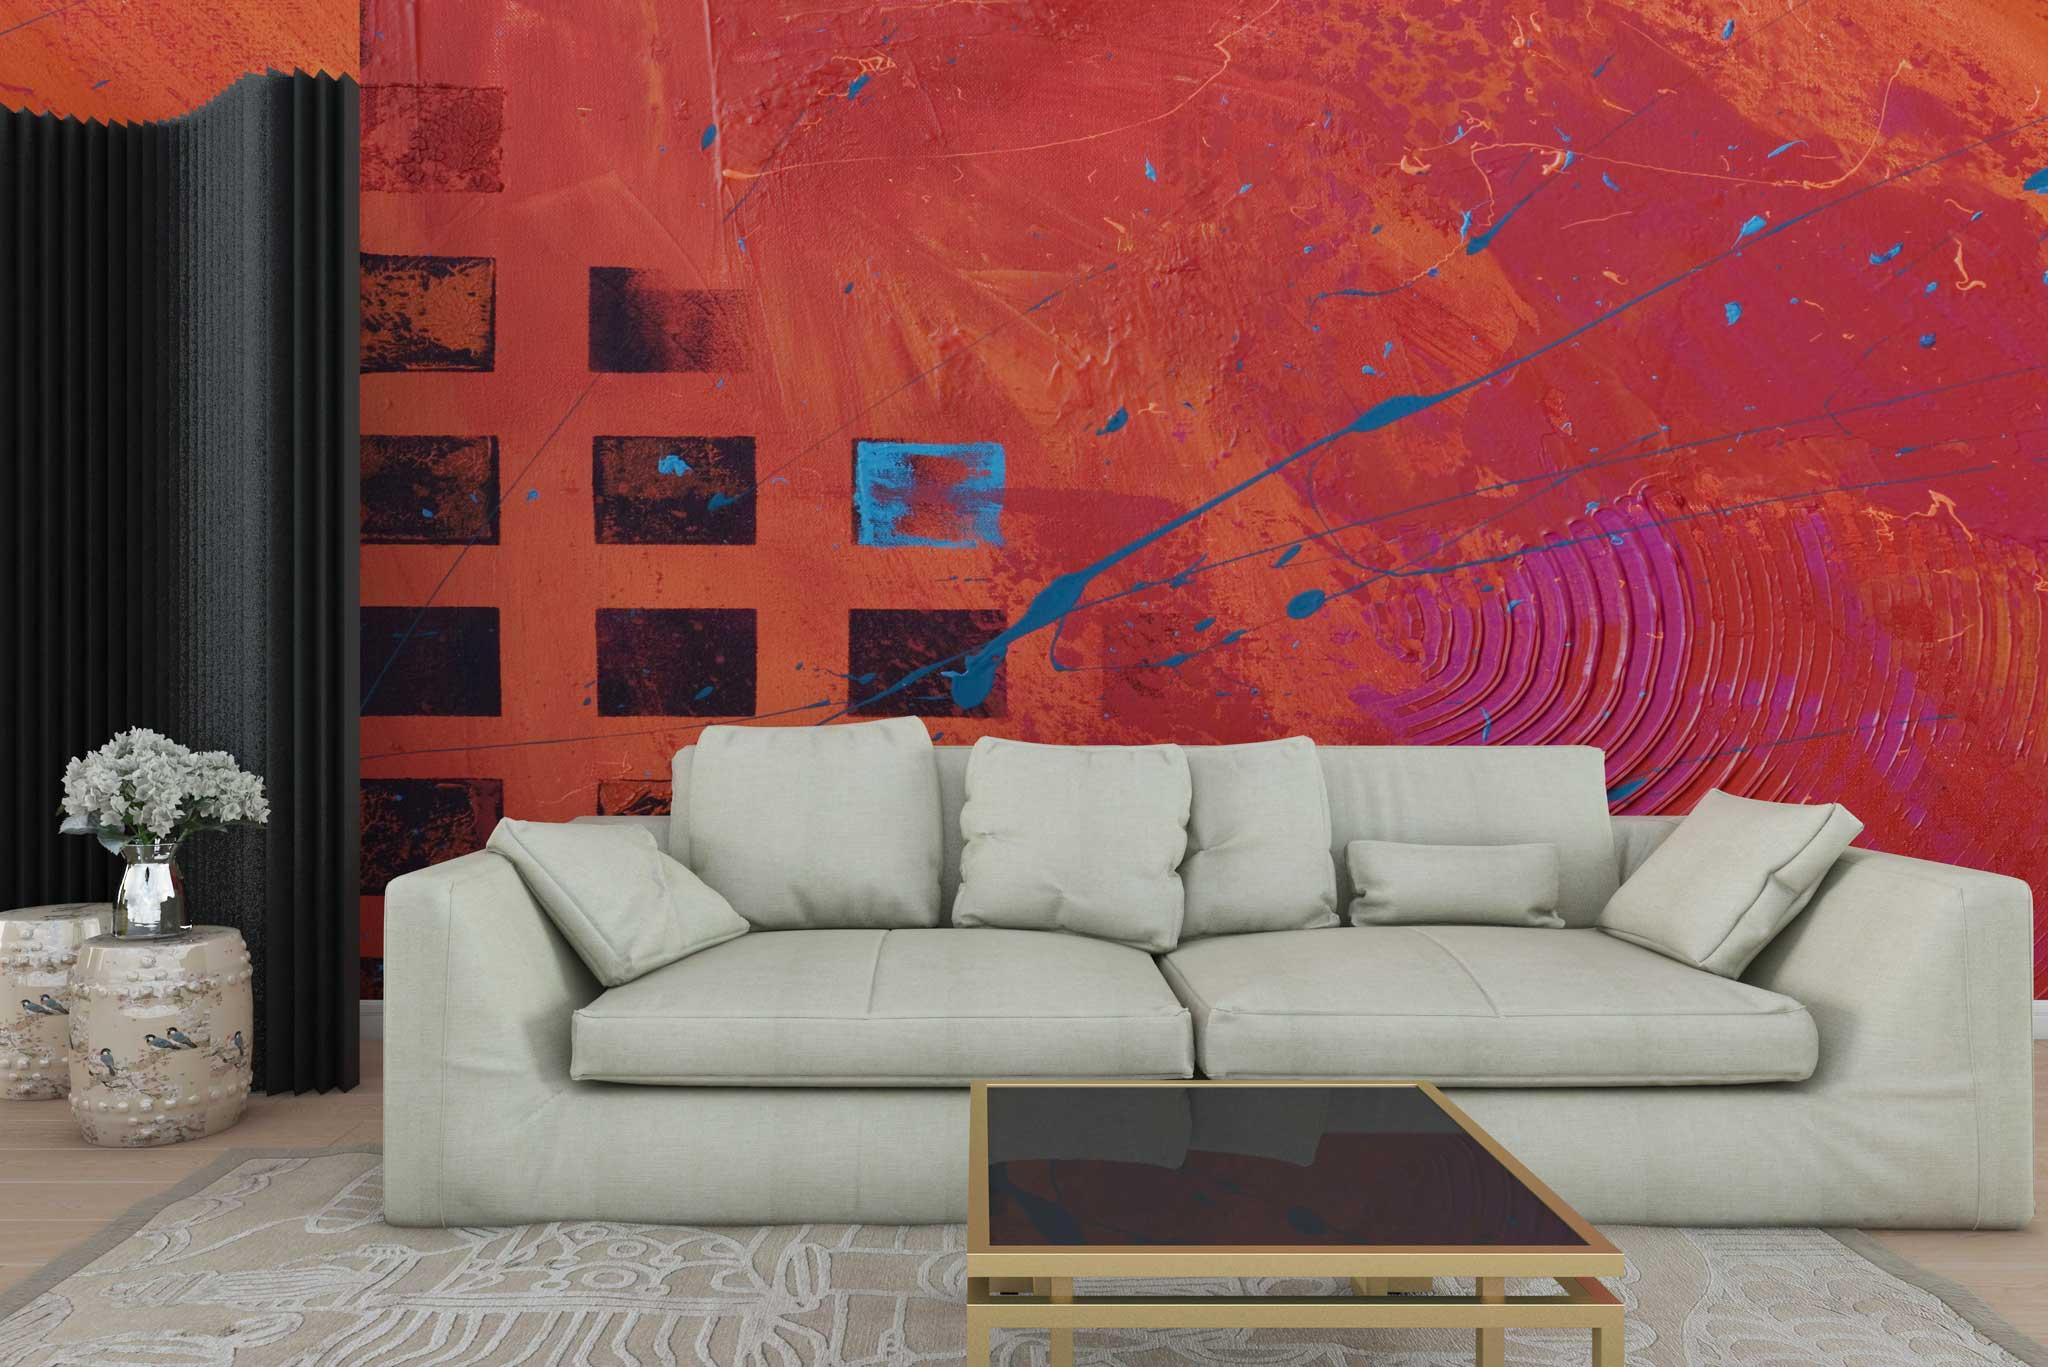 tapet-fototapet-personalizat-comanda-bucuresti-pictura-abstracta-grafic-patrate-negre-rosu-perete-lux-special